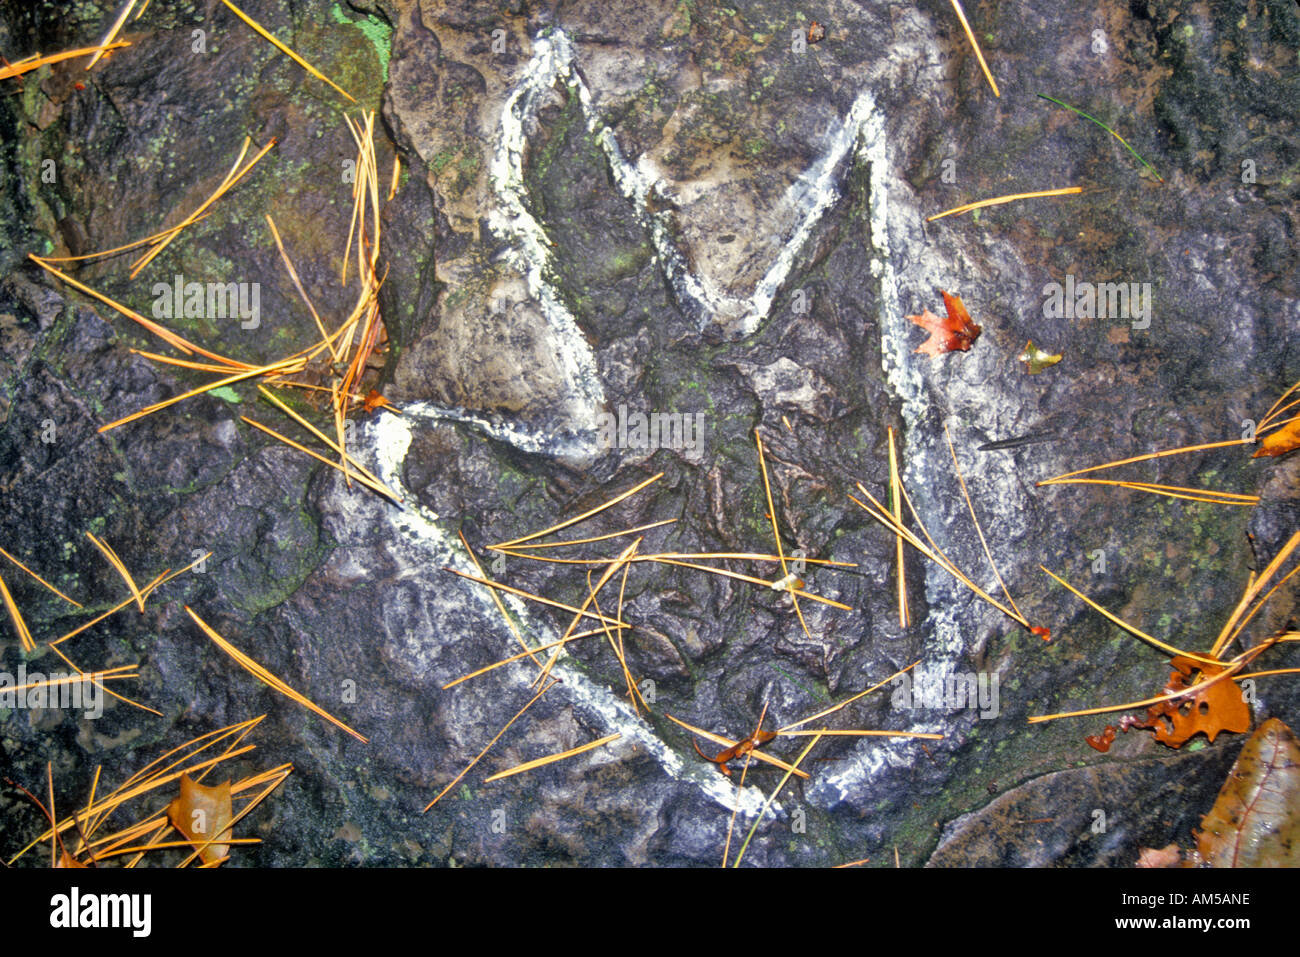 Dinosaur Footprint South Hadley Massachusetts - Stock Image